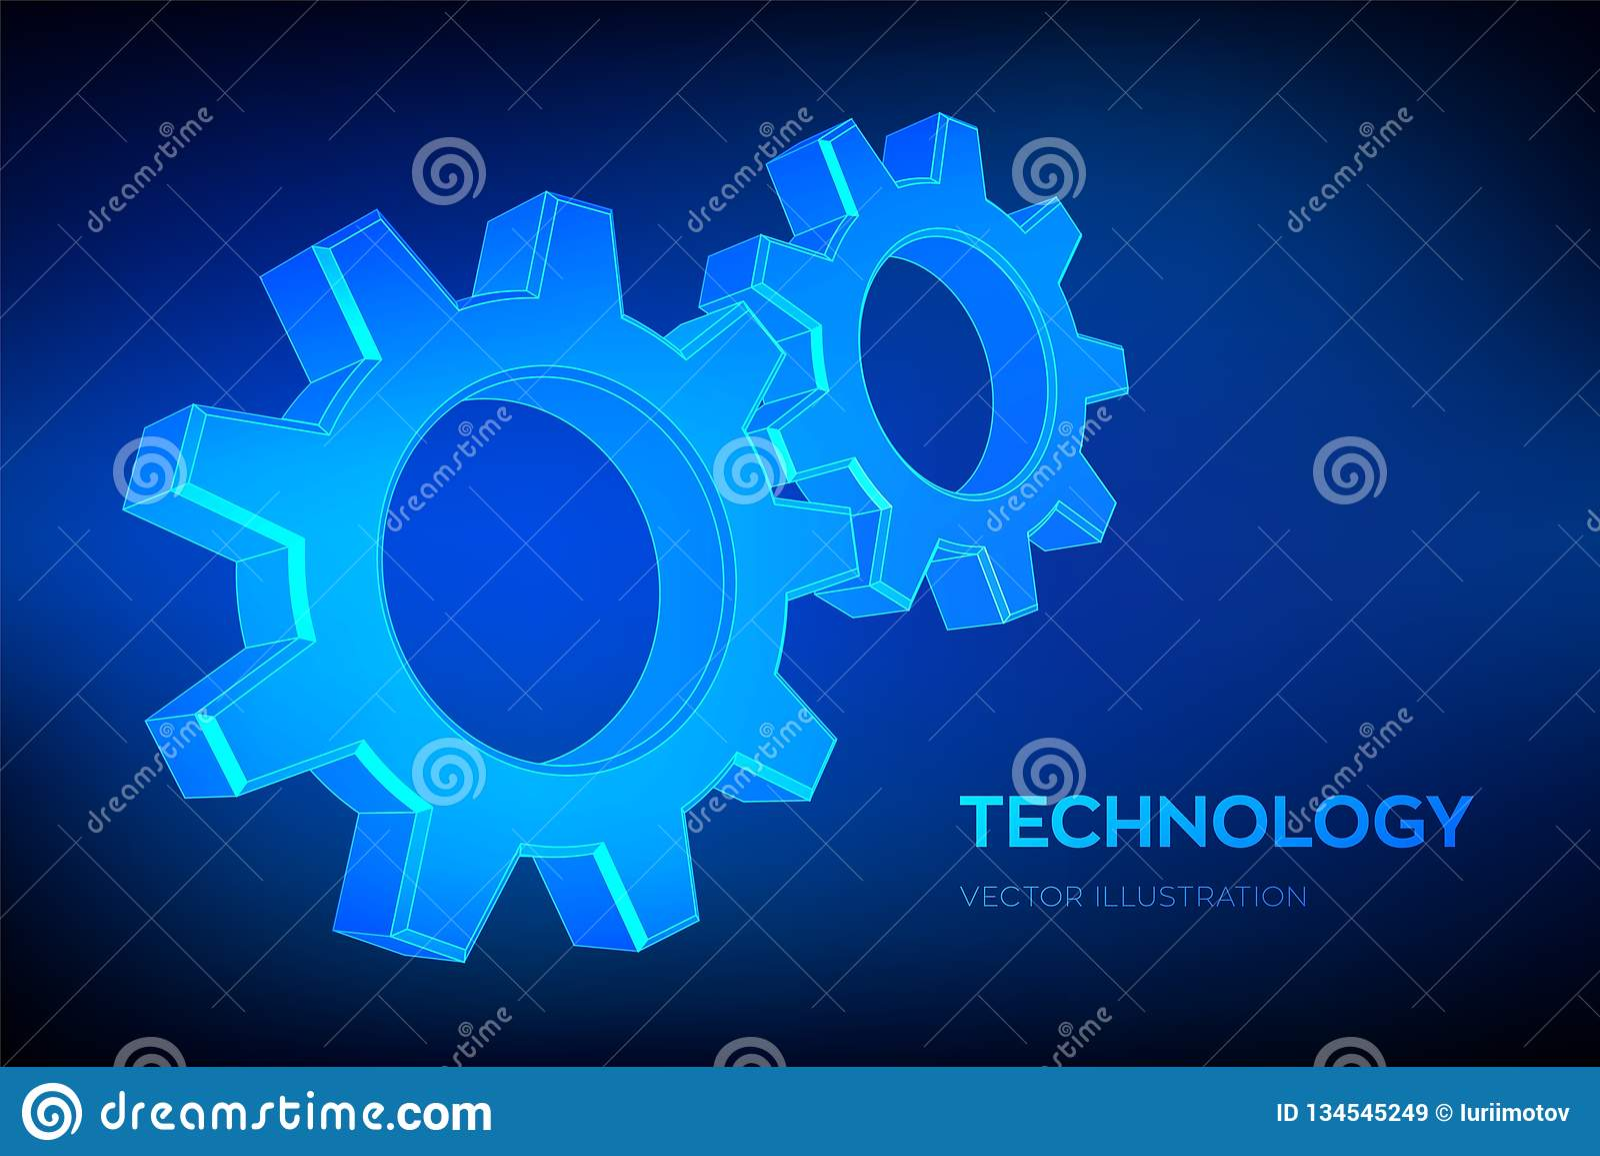 Gears. Engineering Gear wheels. 3D wireframe mesh Gear. Mechanical technology machine engineering symbol. Industry